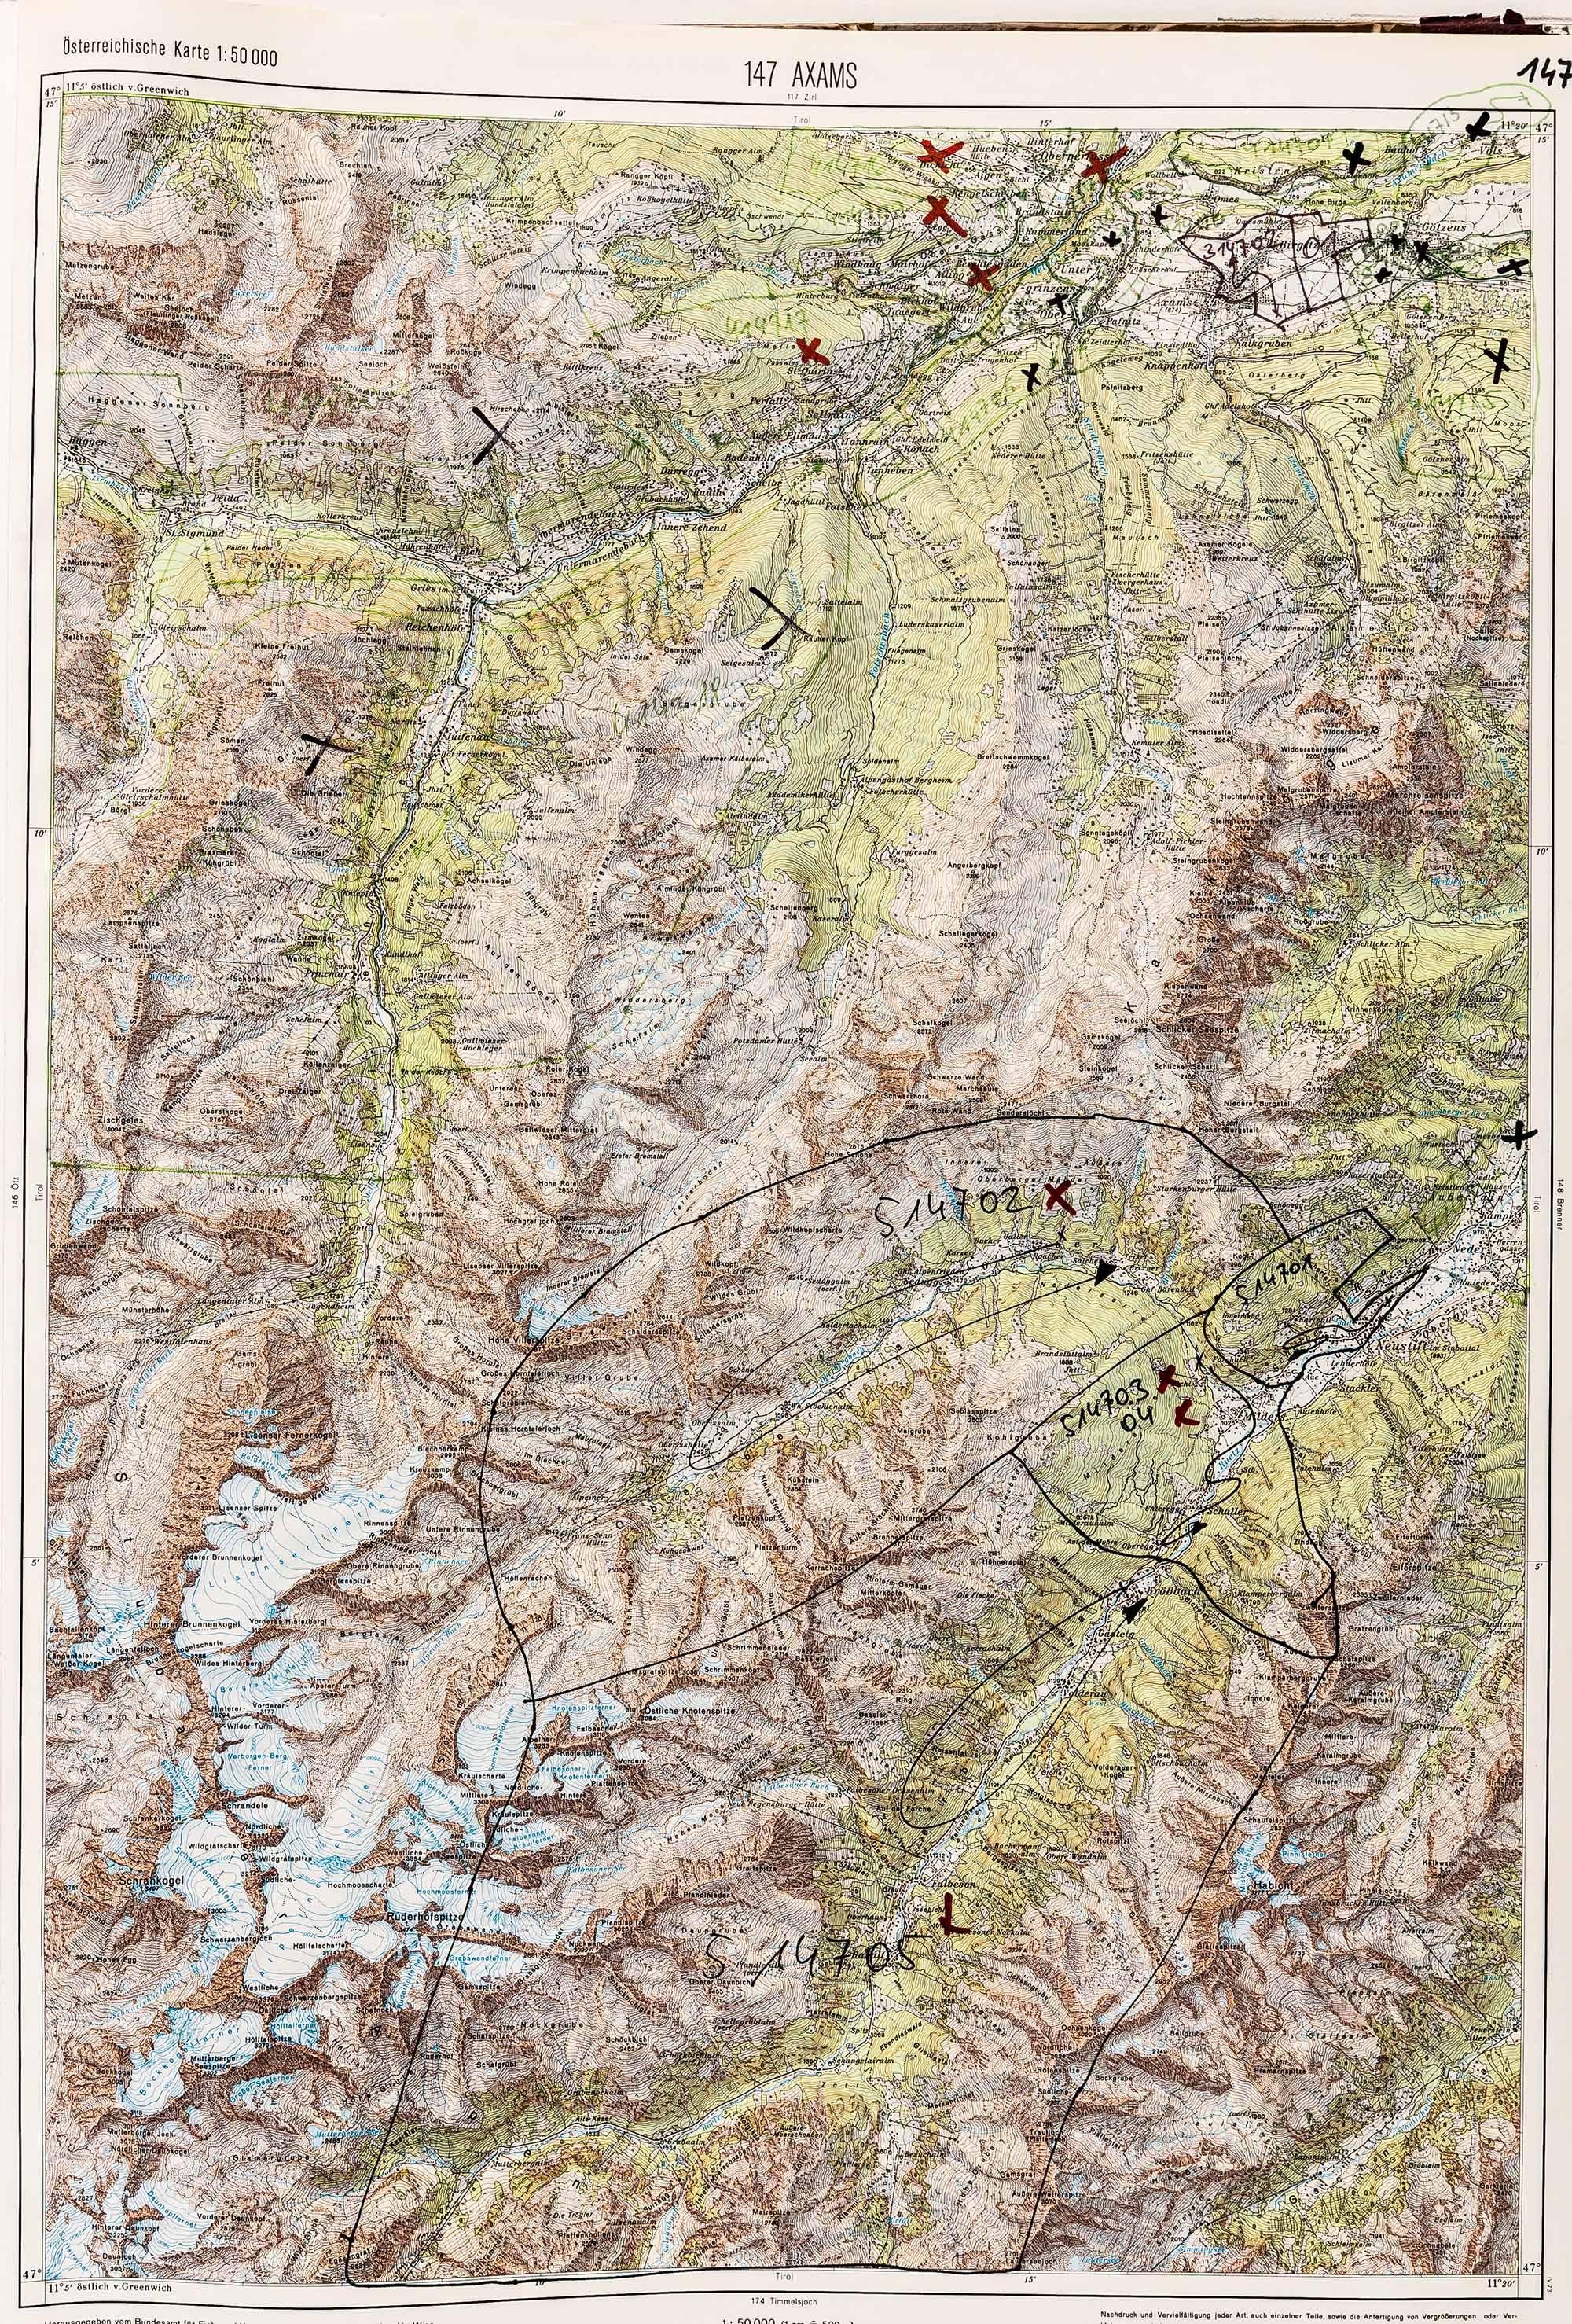 1983-1986 Karte 147